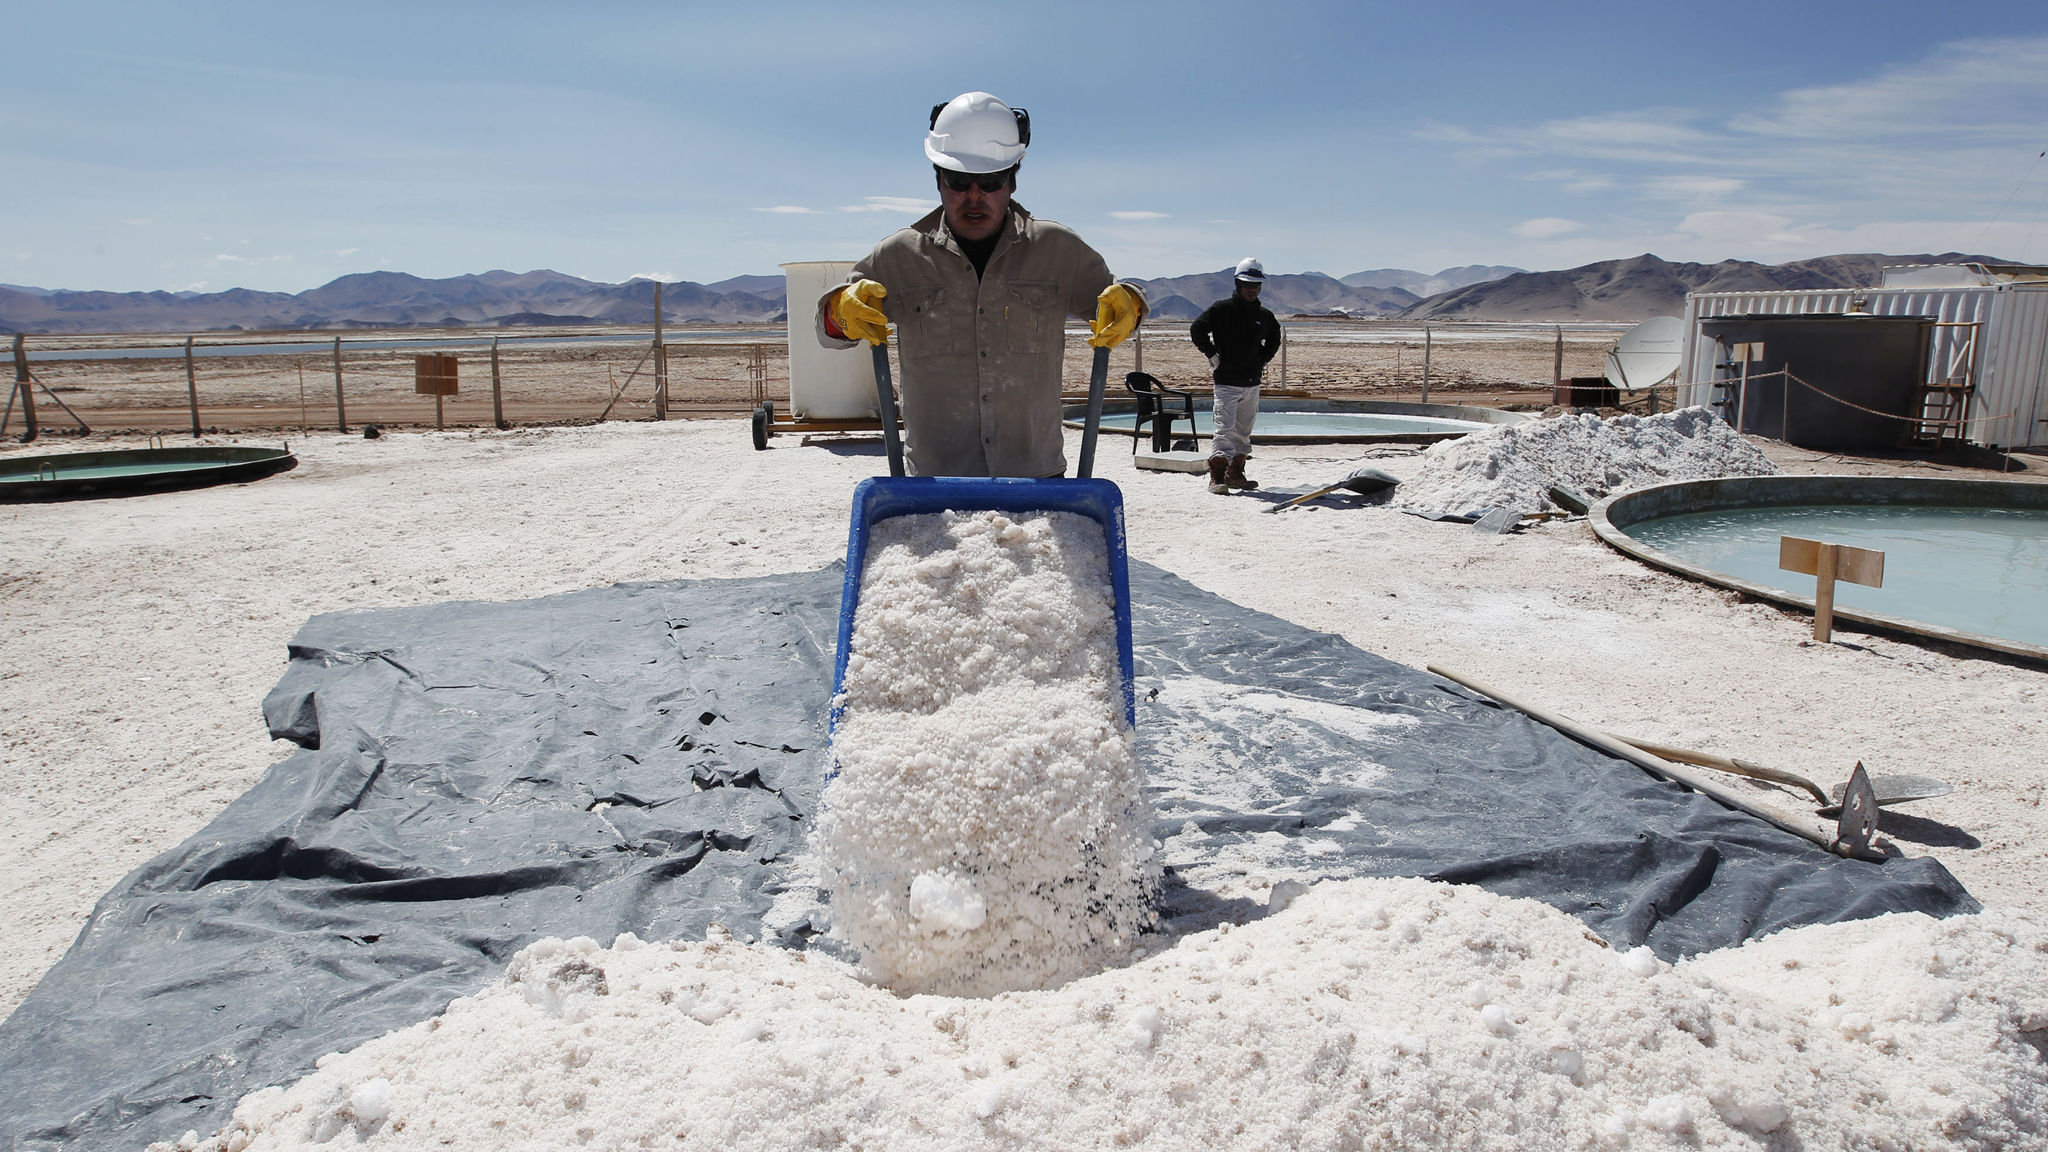 Rio Tinto has 'eureka moment' with California lithium discovery